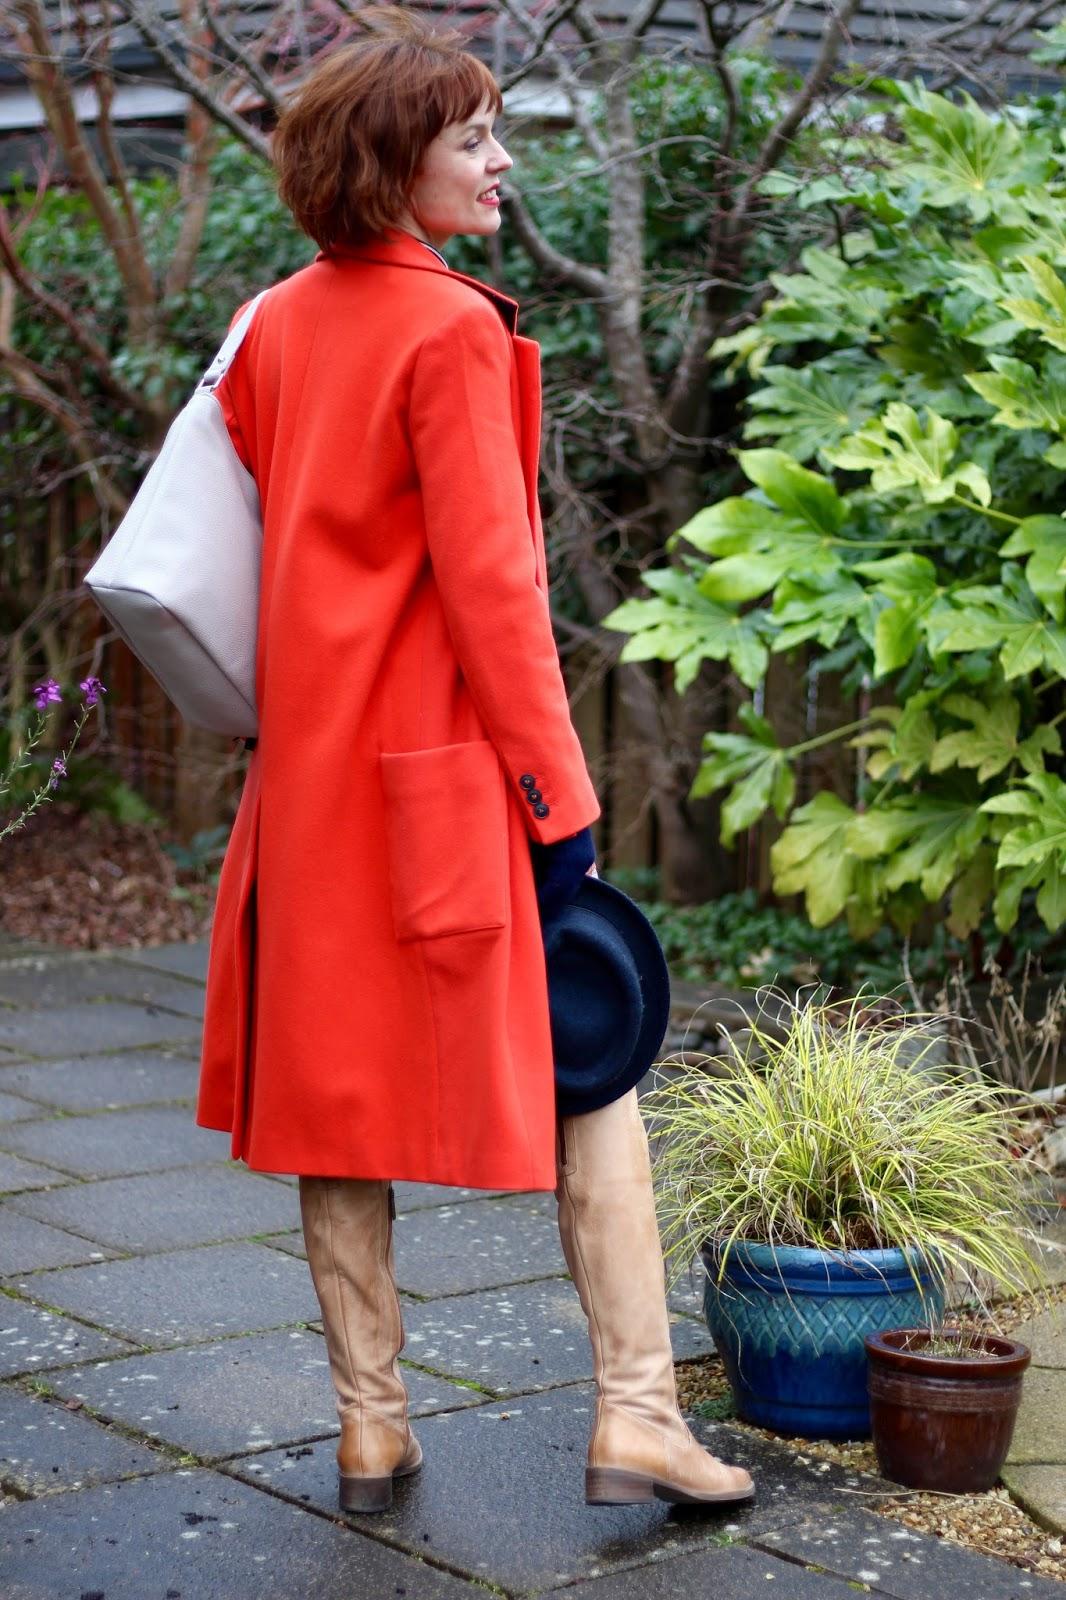 Is orange an Unprofessional Colour? Orange Coat, Navy, Grey and Tan, over 40.